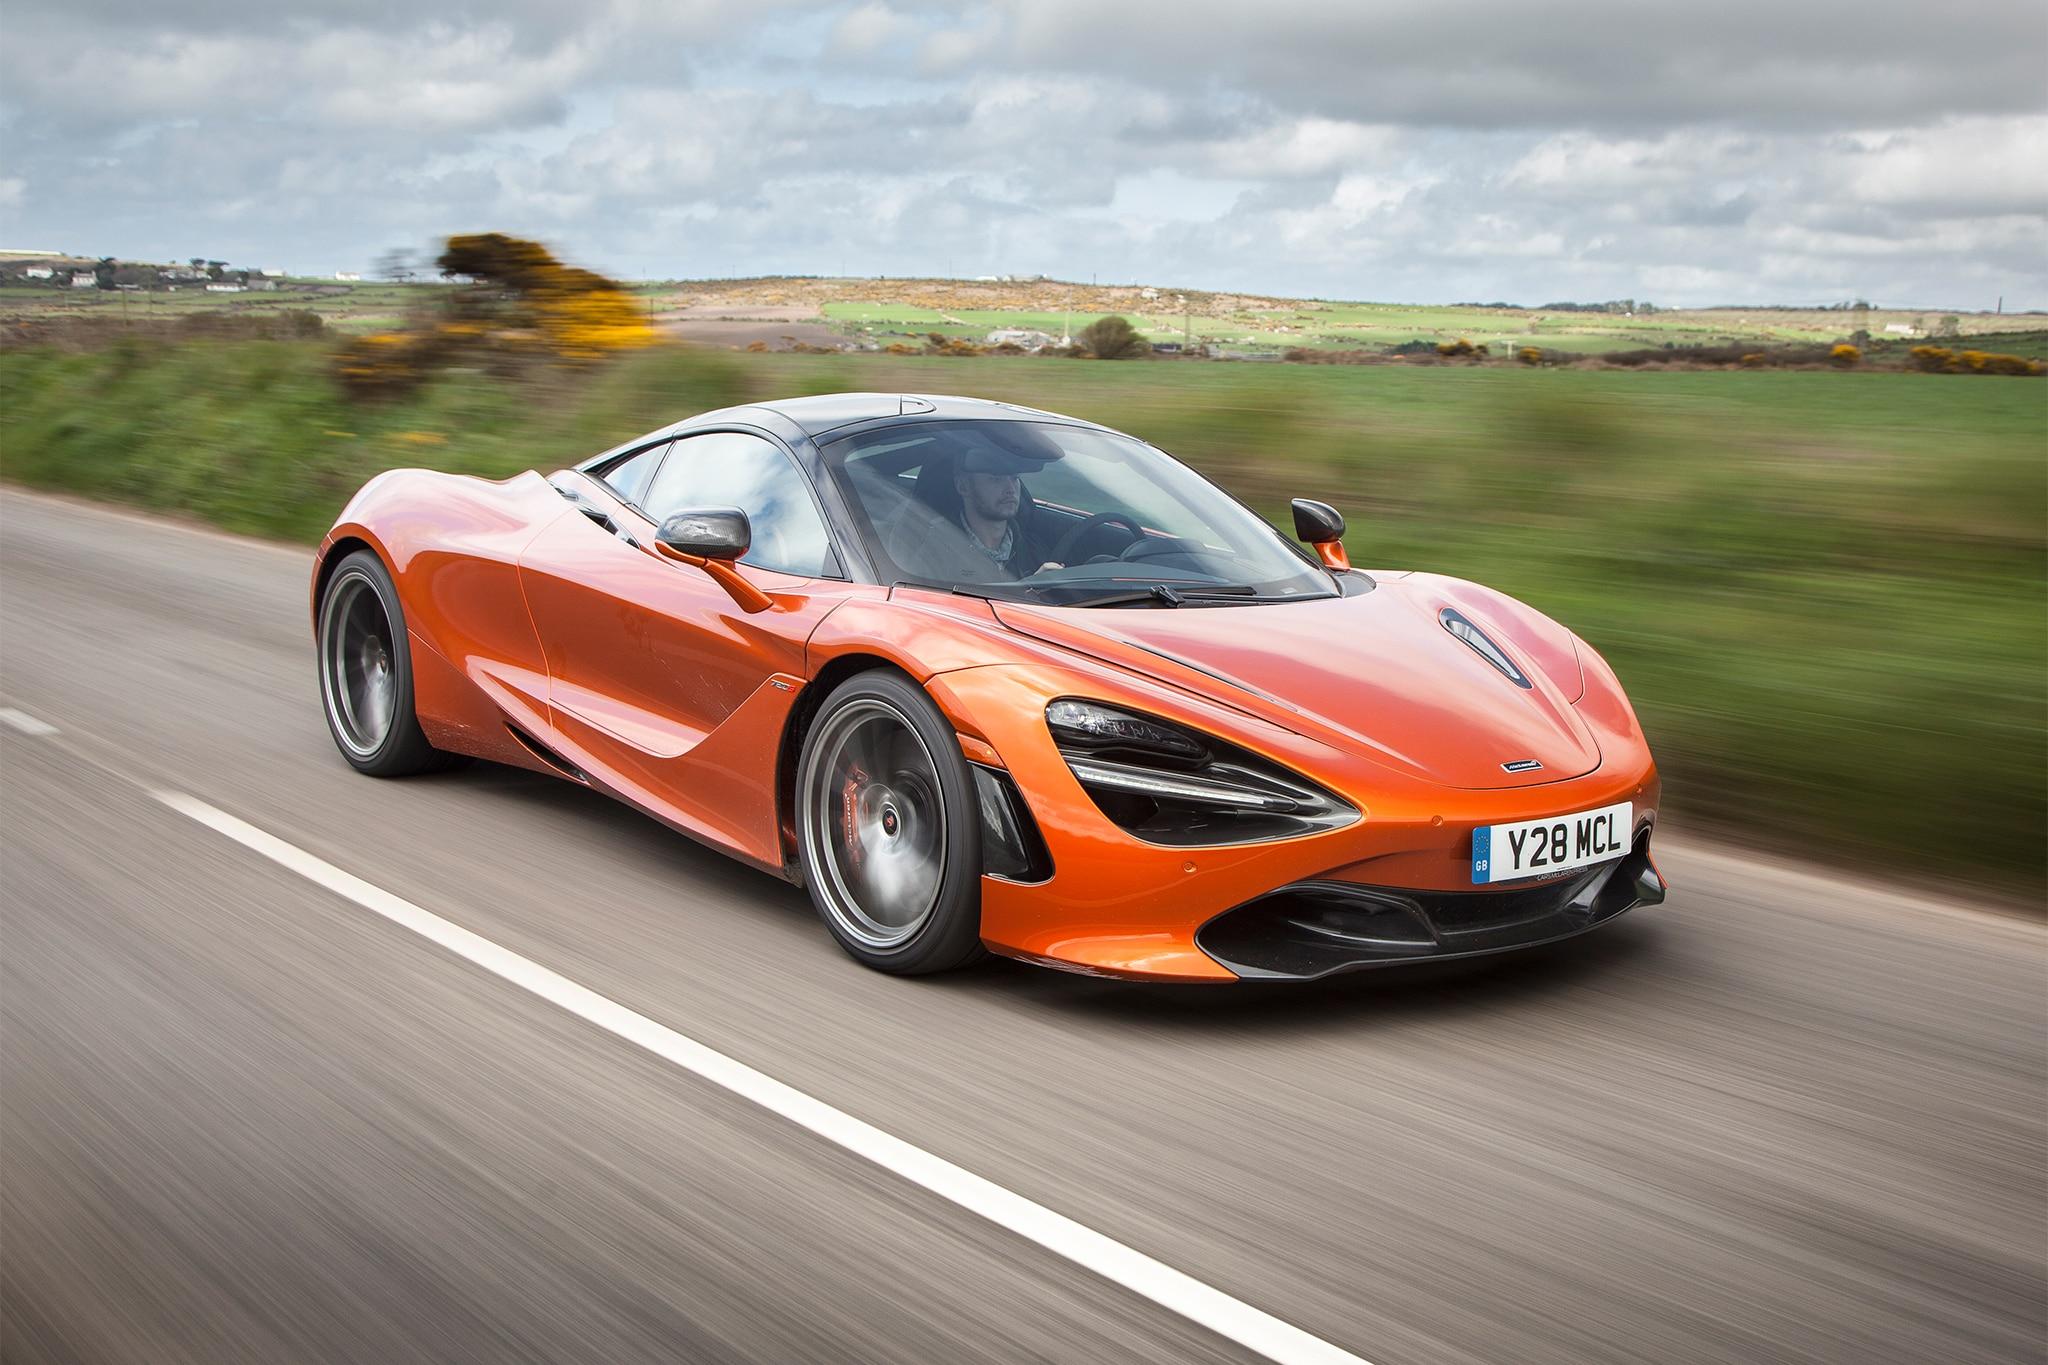 2018 McLaren 720S Front Three Quarter In Motion 05 3